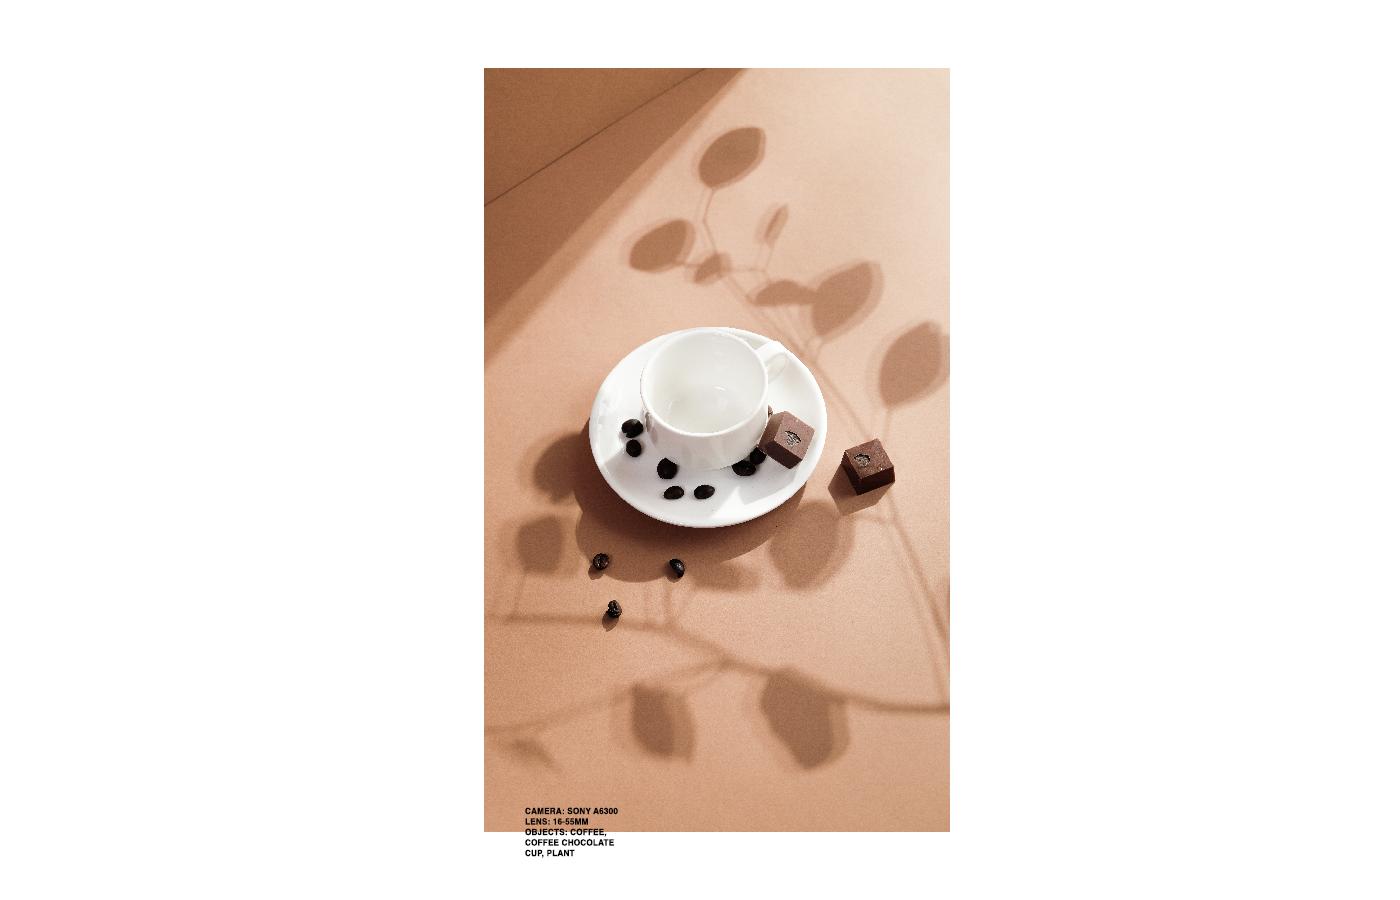 design graphic design  art direction  dubai chocolate Photography  branding  editorial photography still life photography content cration